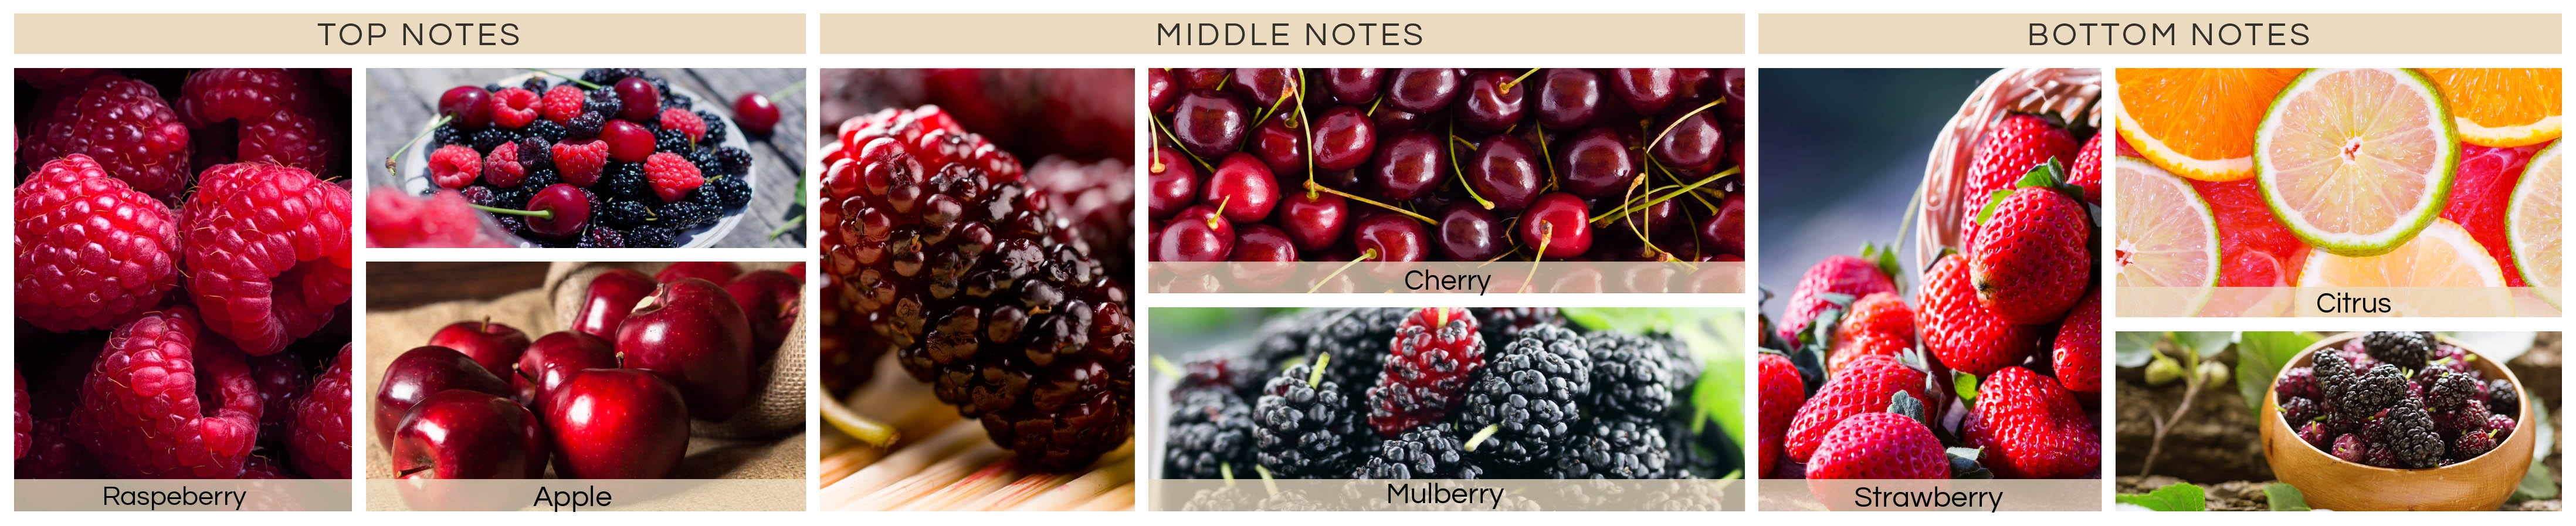 simply-mulberry-jpg5760296c574e7-min591c014784101